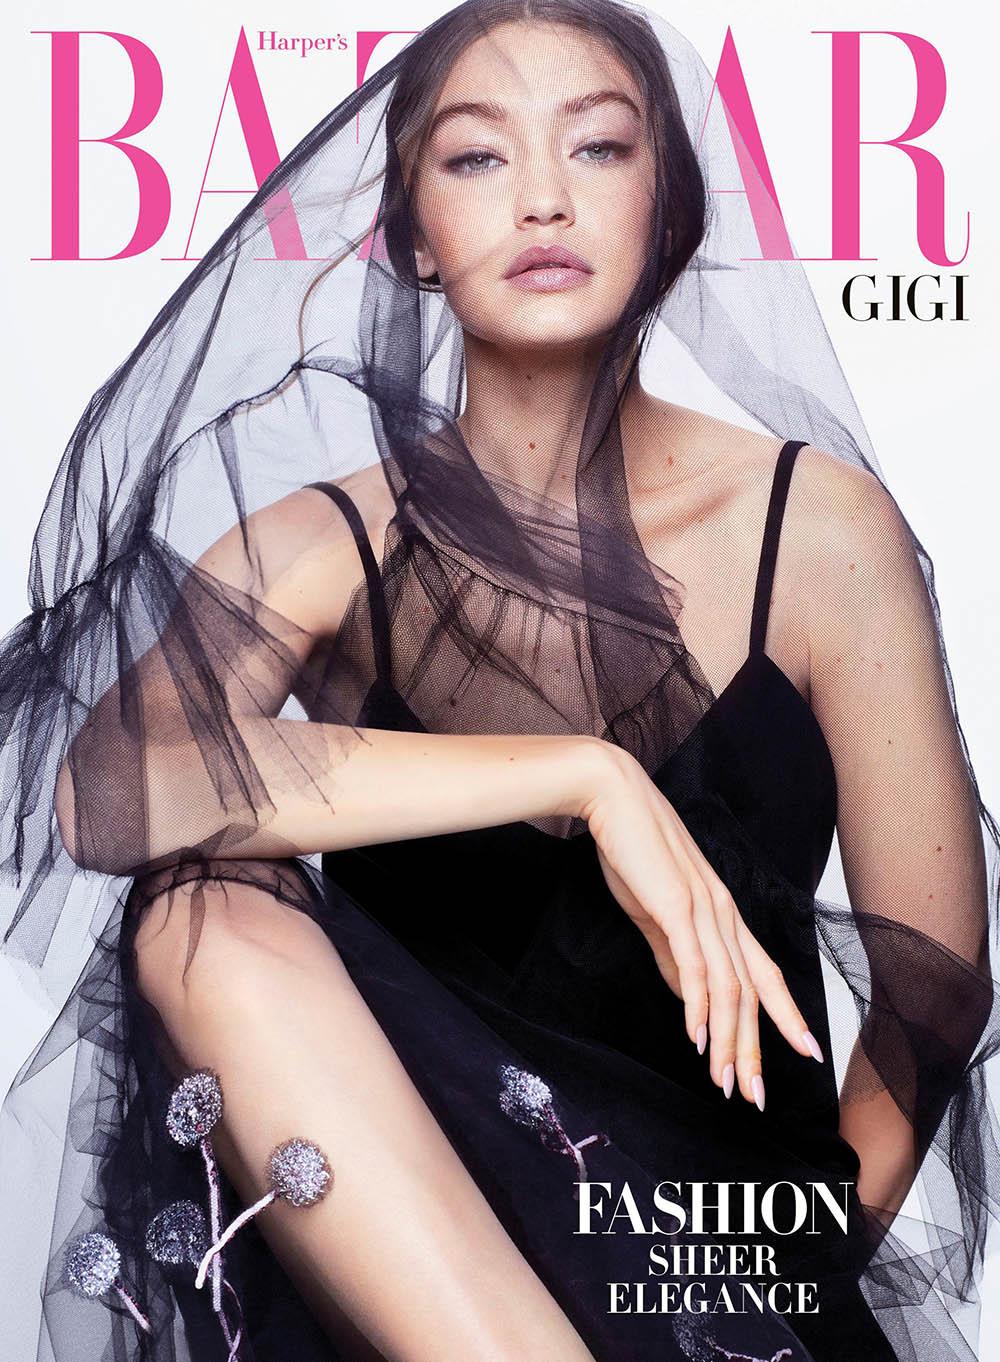 Gigi Hadid covers Harper's Bazaar US April 2020 by Sølve Sundsbø